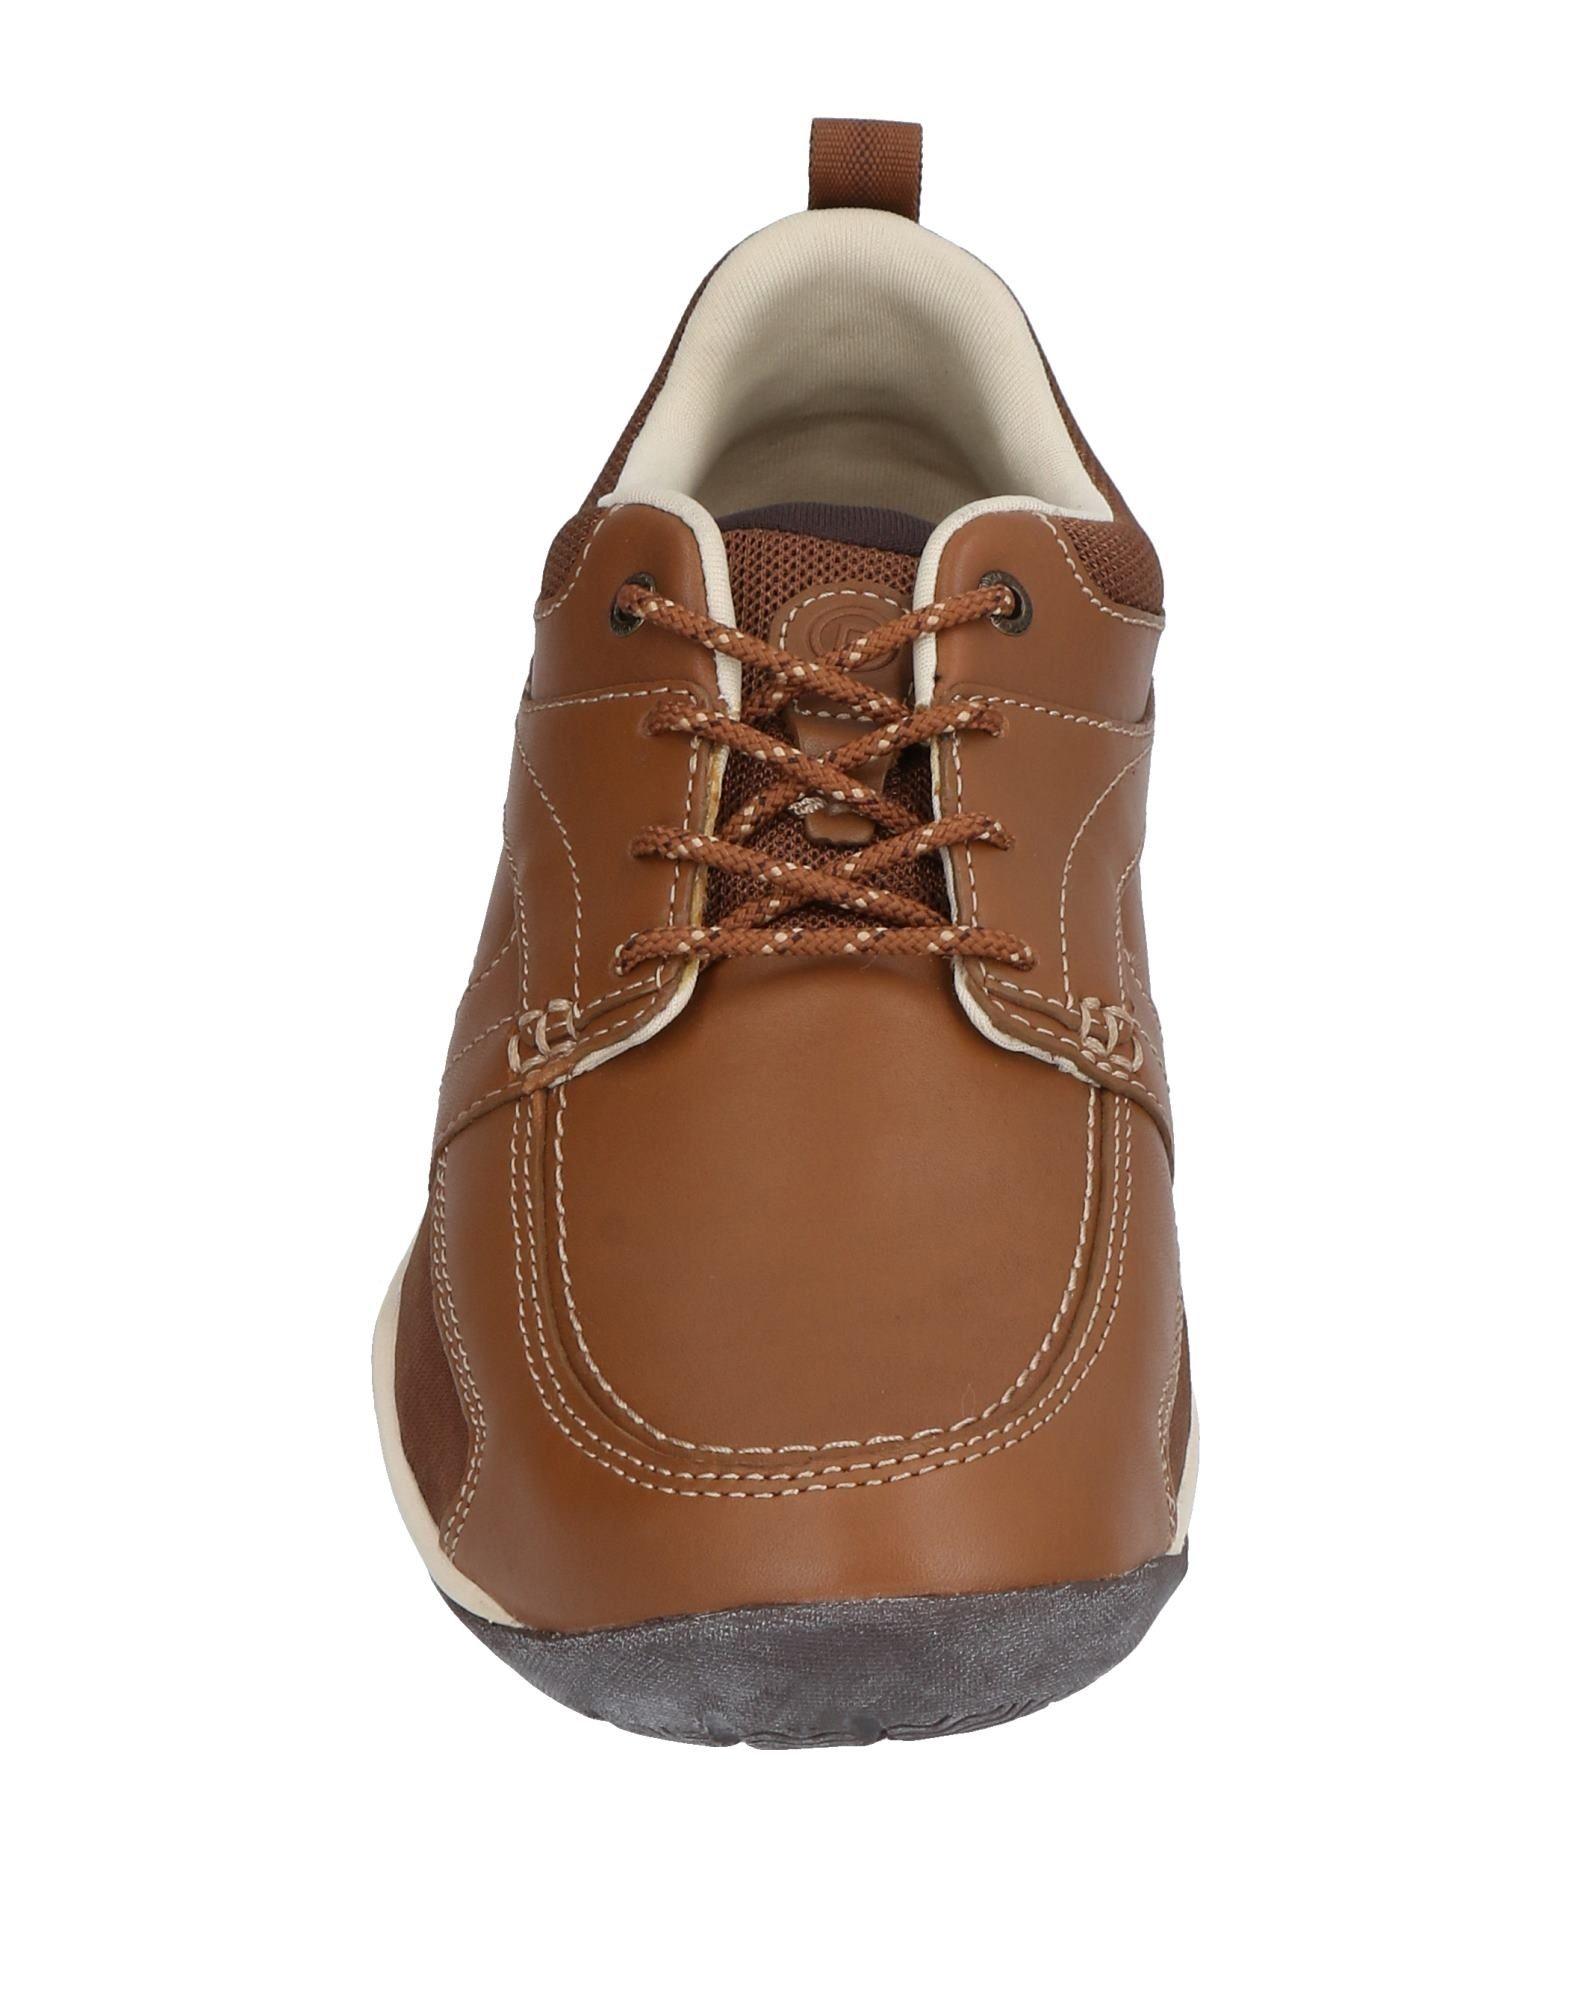 Moda 11509125UQ Sneakers Rockport Uomo - 11509125UQ Moda 513138